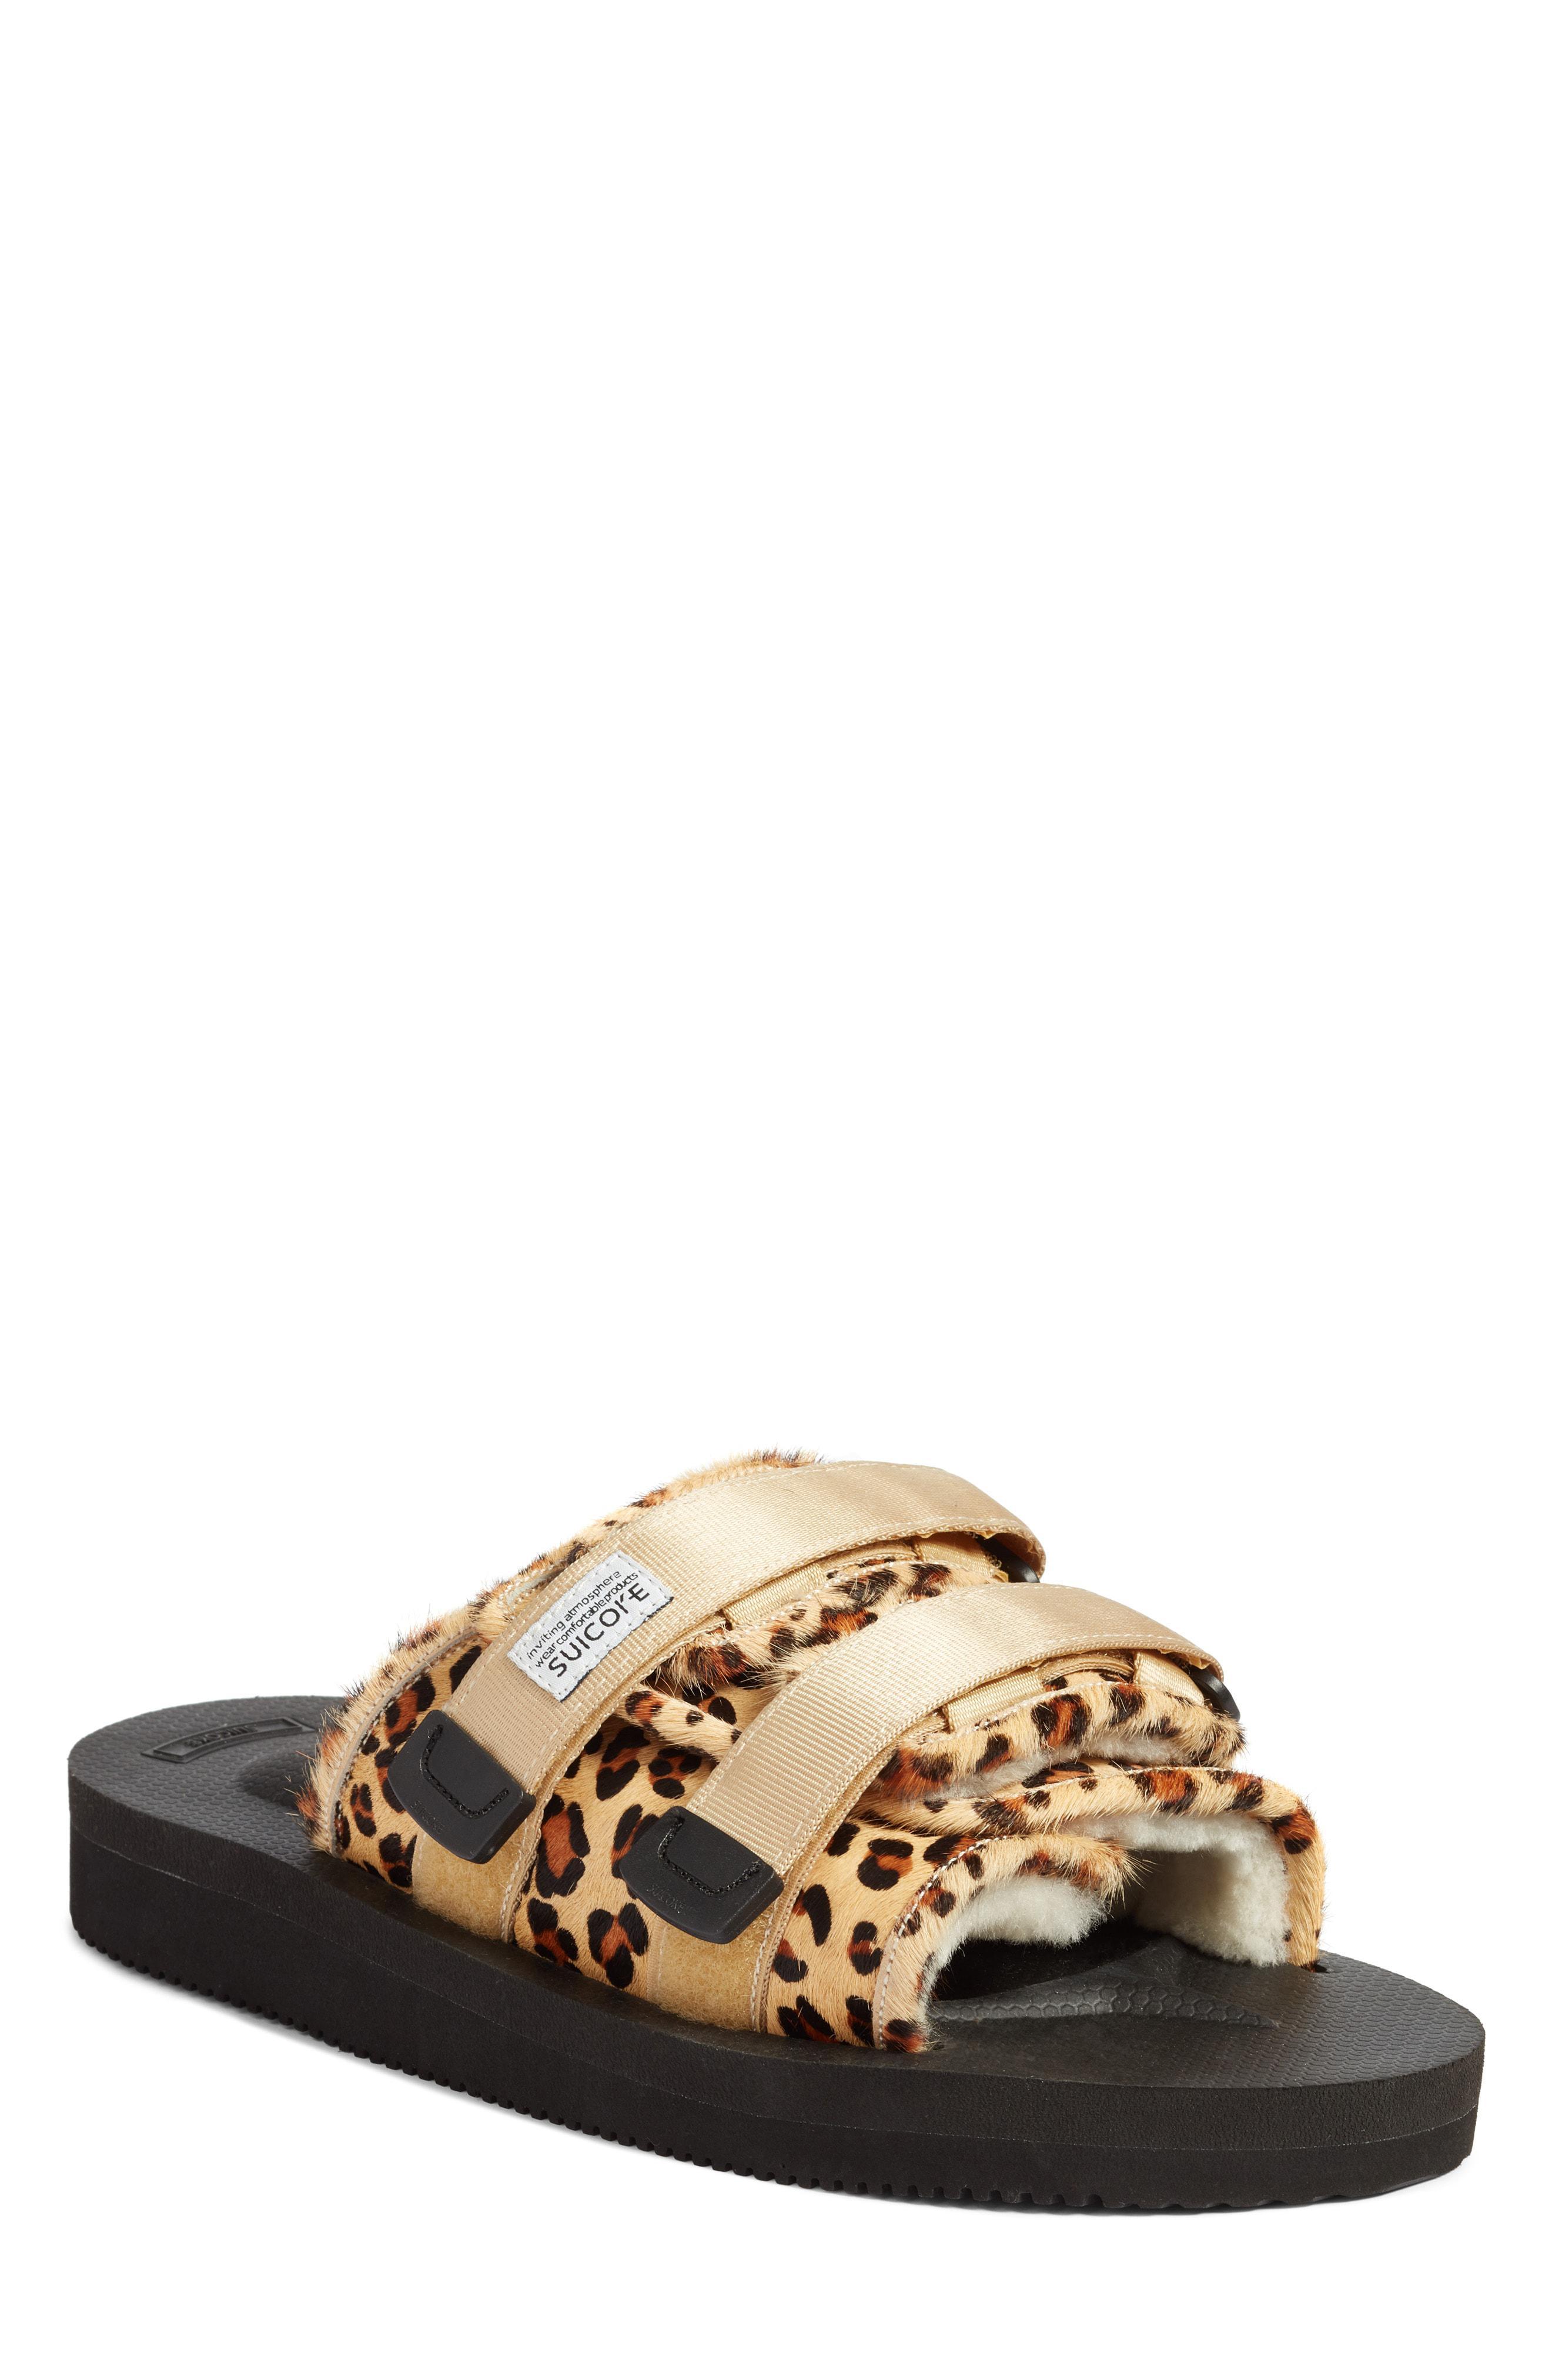 a5ce5396747 Lyst - Suicoke Moto Cab Genuine Calf Hair Slide Sandal in Natural ...